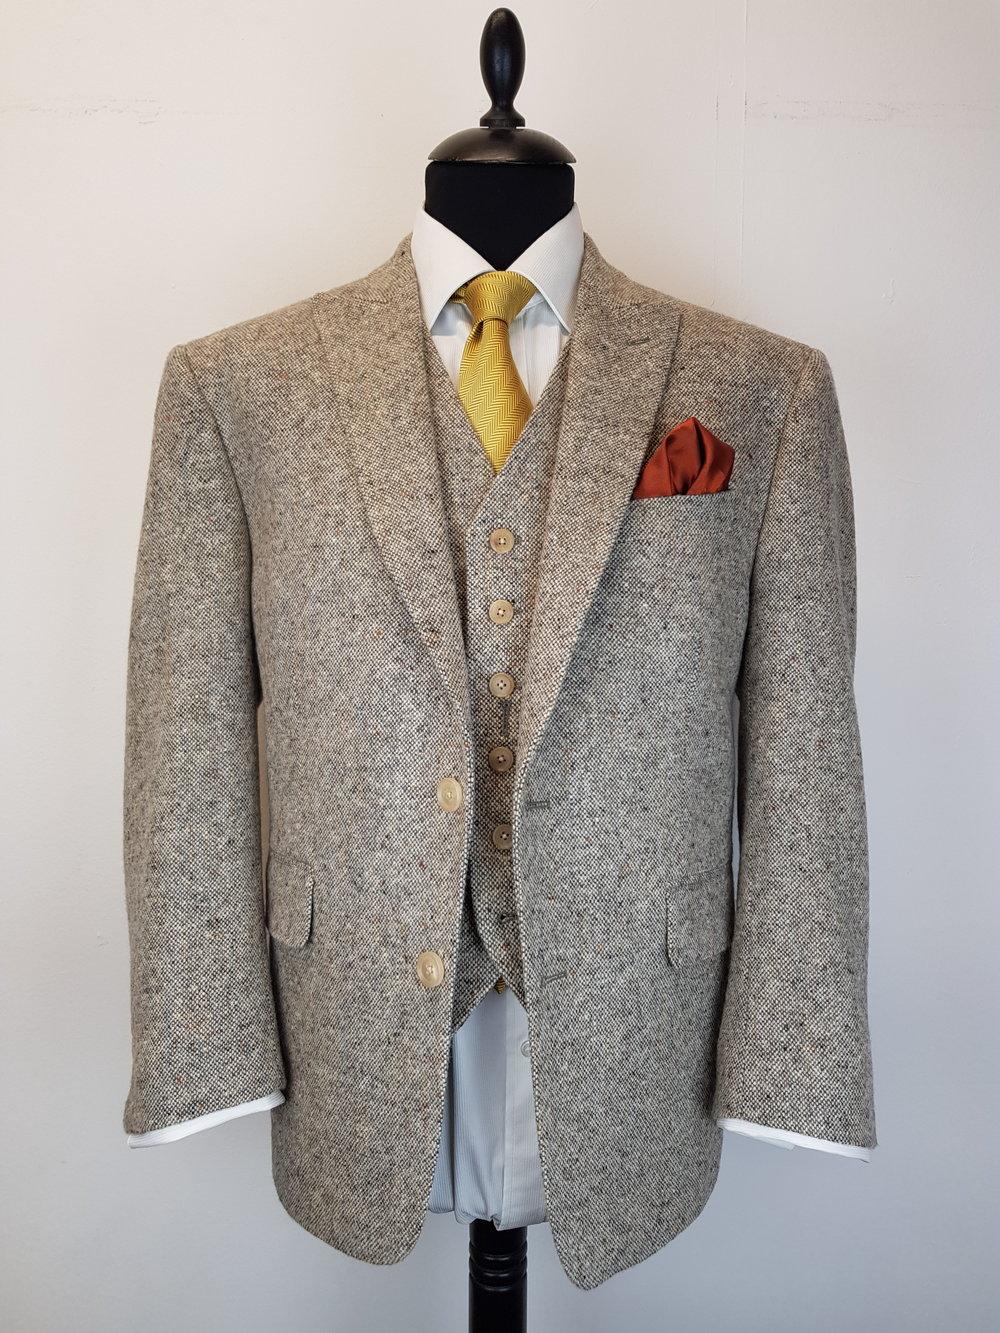 Molloy Donegal Tweed Suit (2).jpg